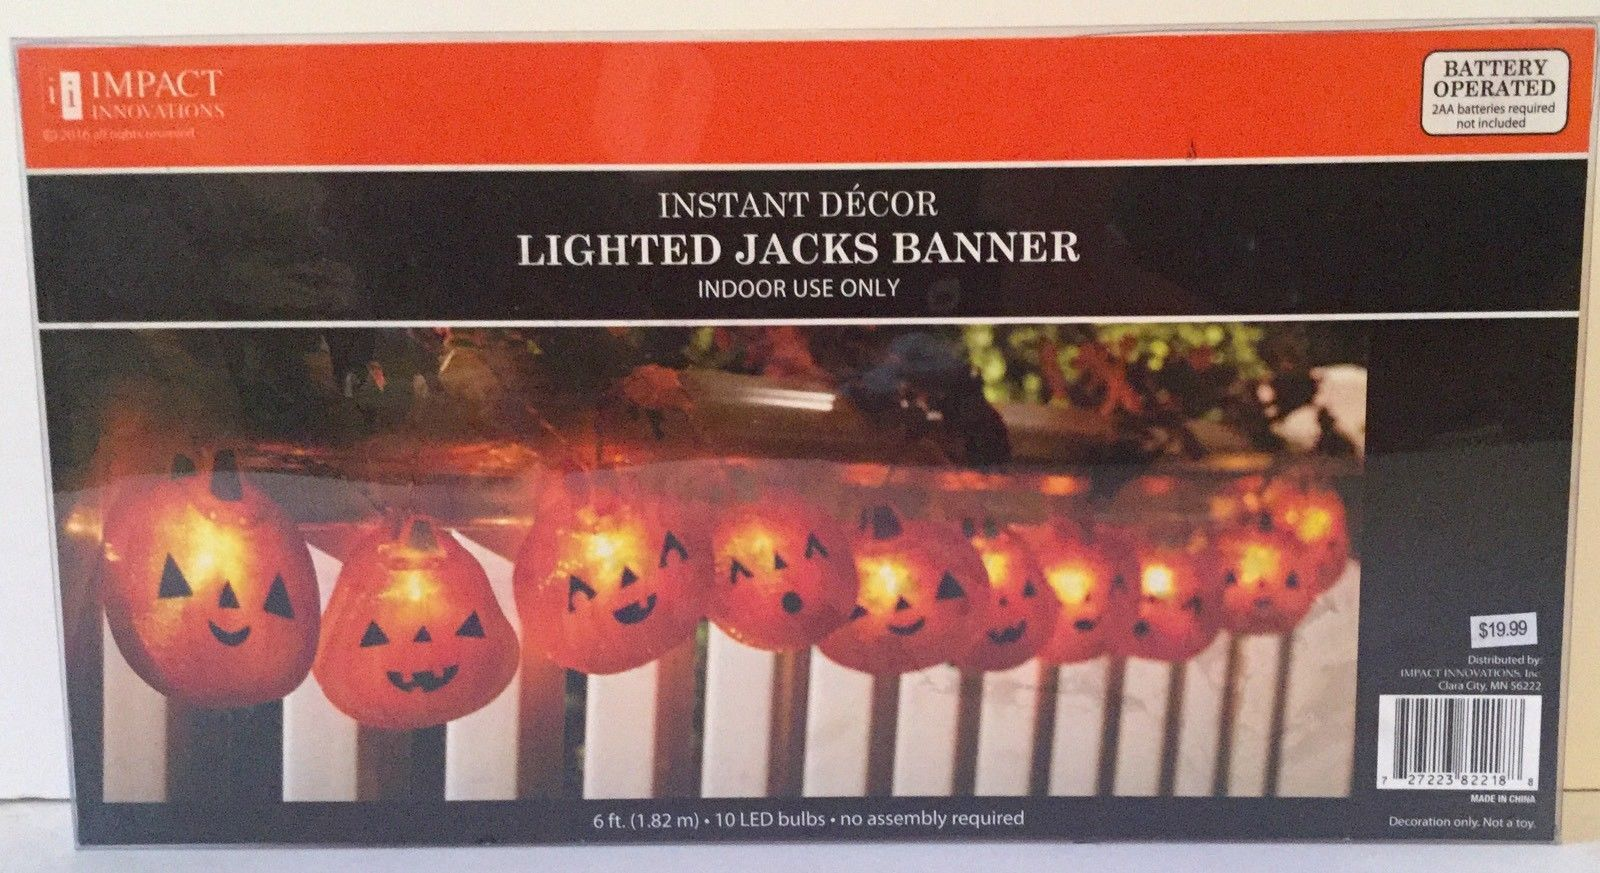 Instant HALLOWEEN Decor LIGHTED JACKS BANNER 6' Length, 10 LED Bulbs, Battery Op